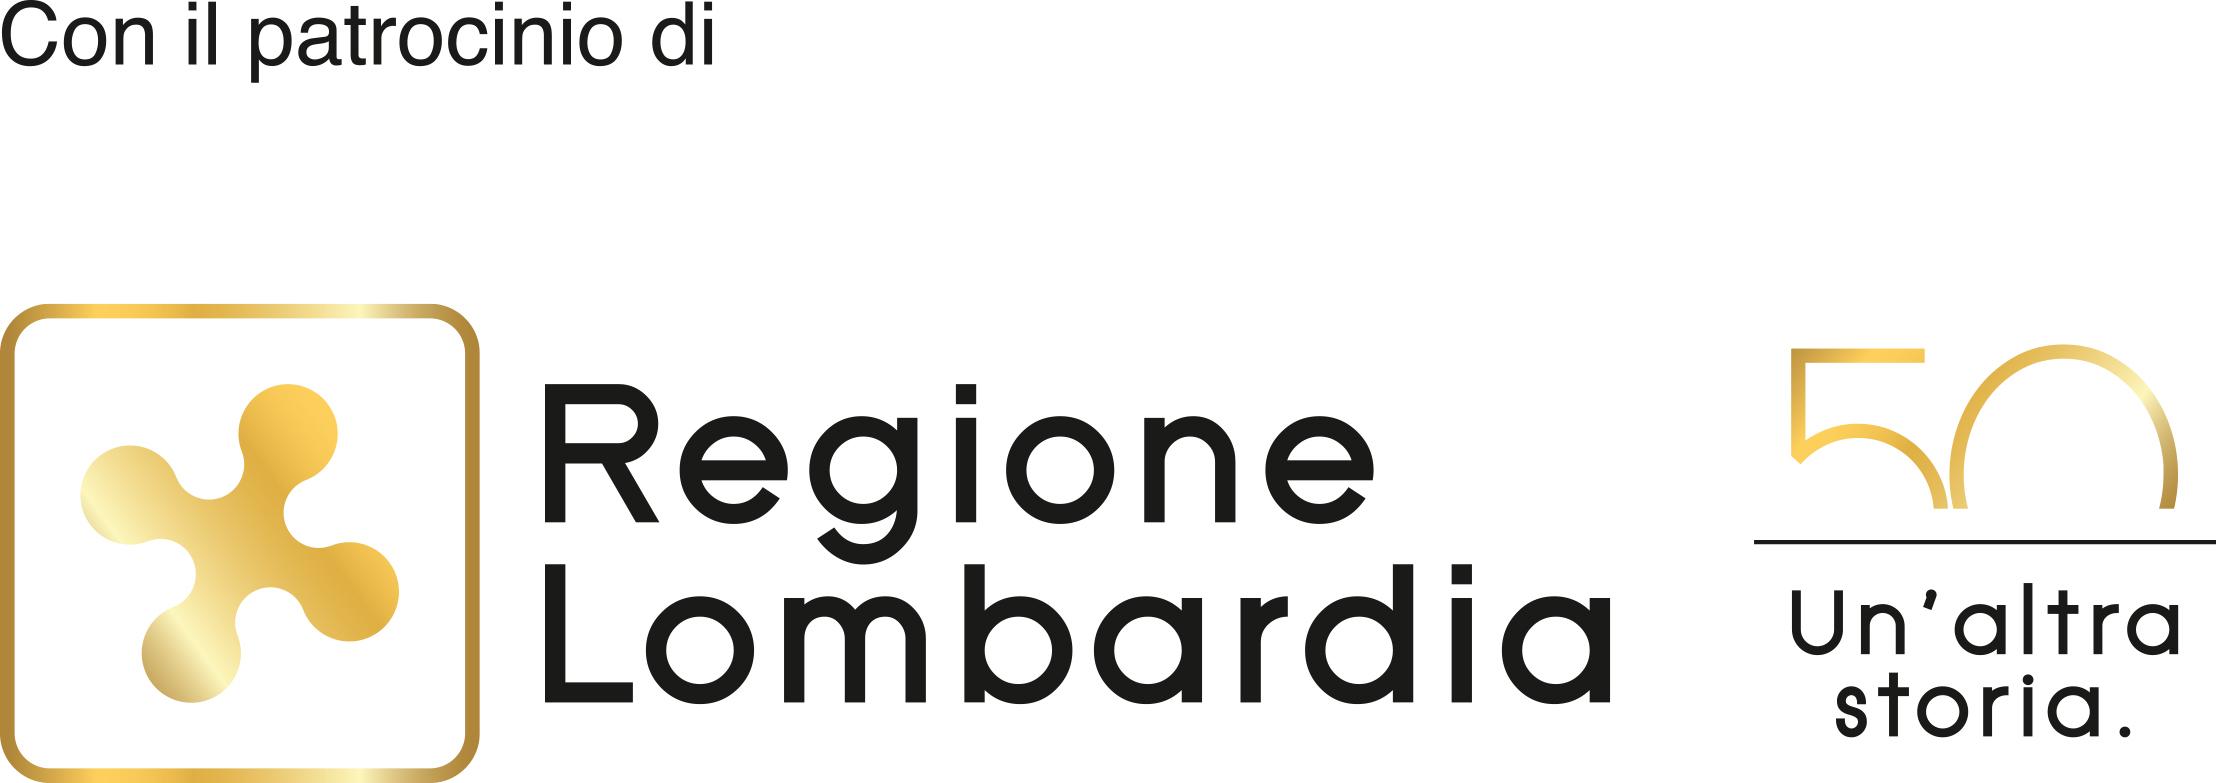 RegioneLombardia